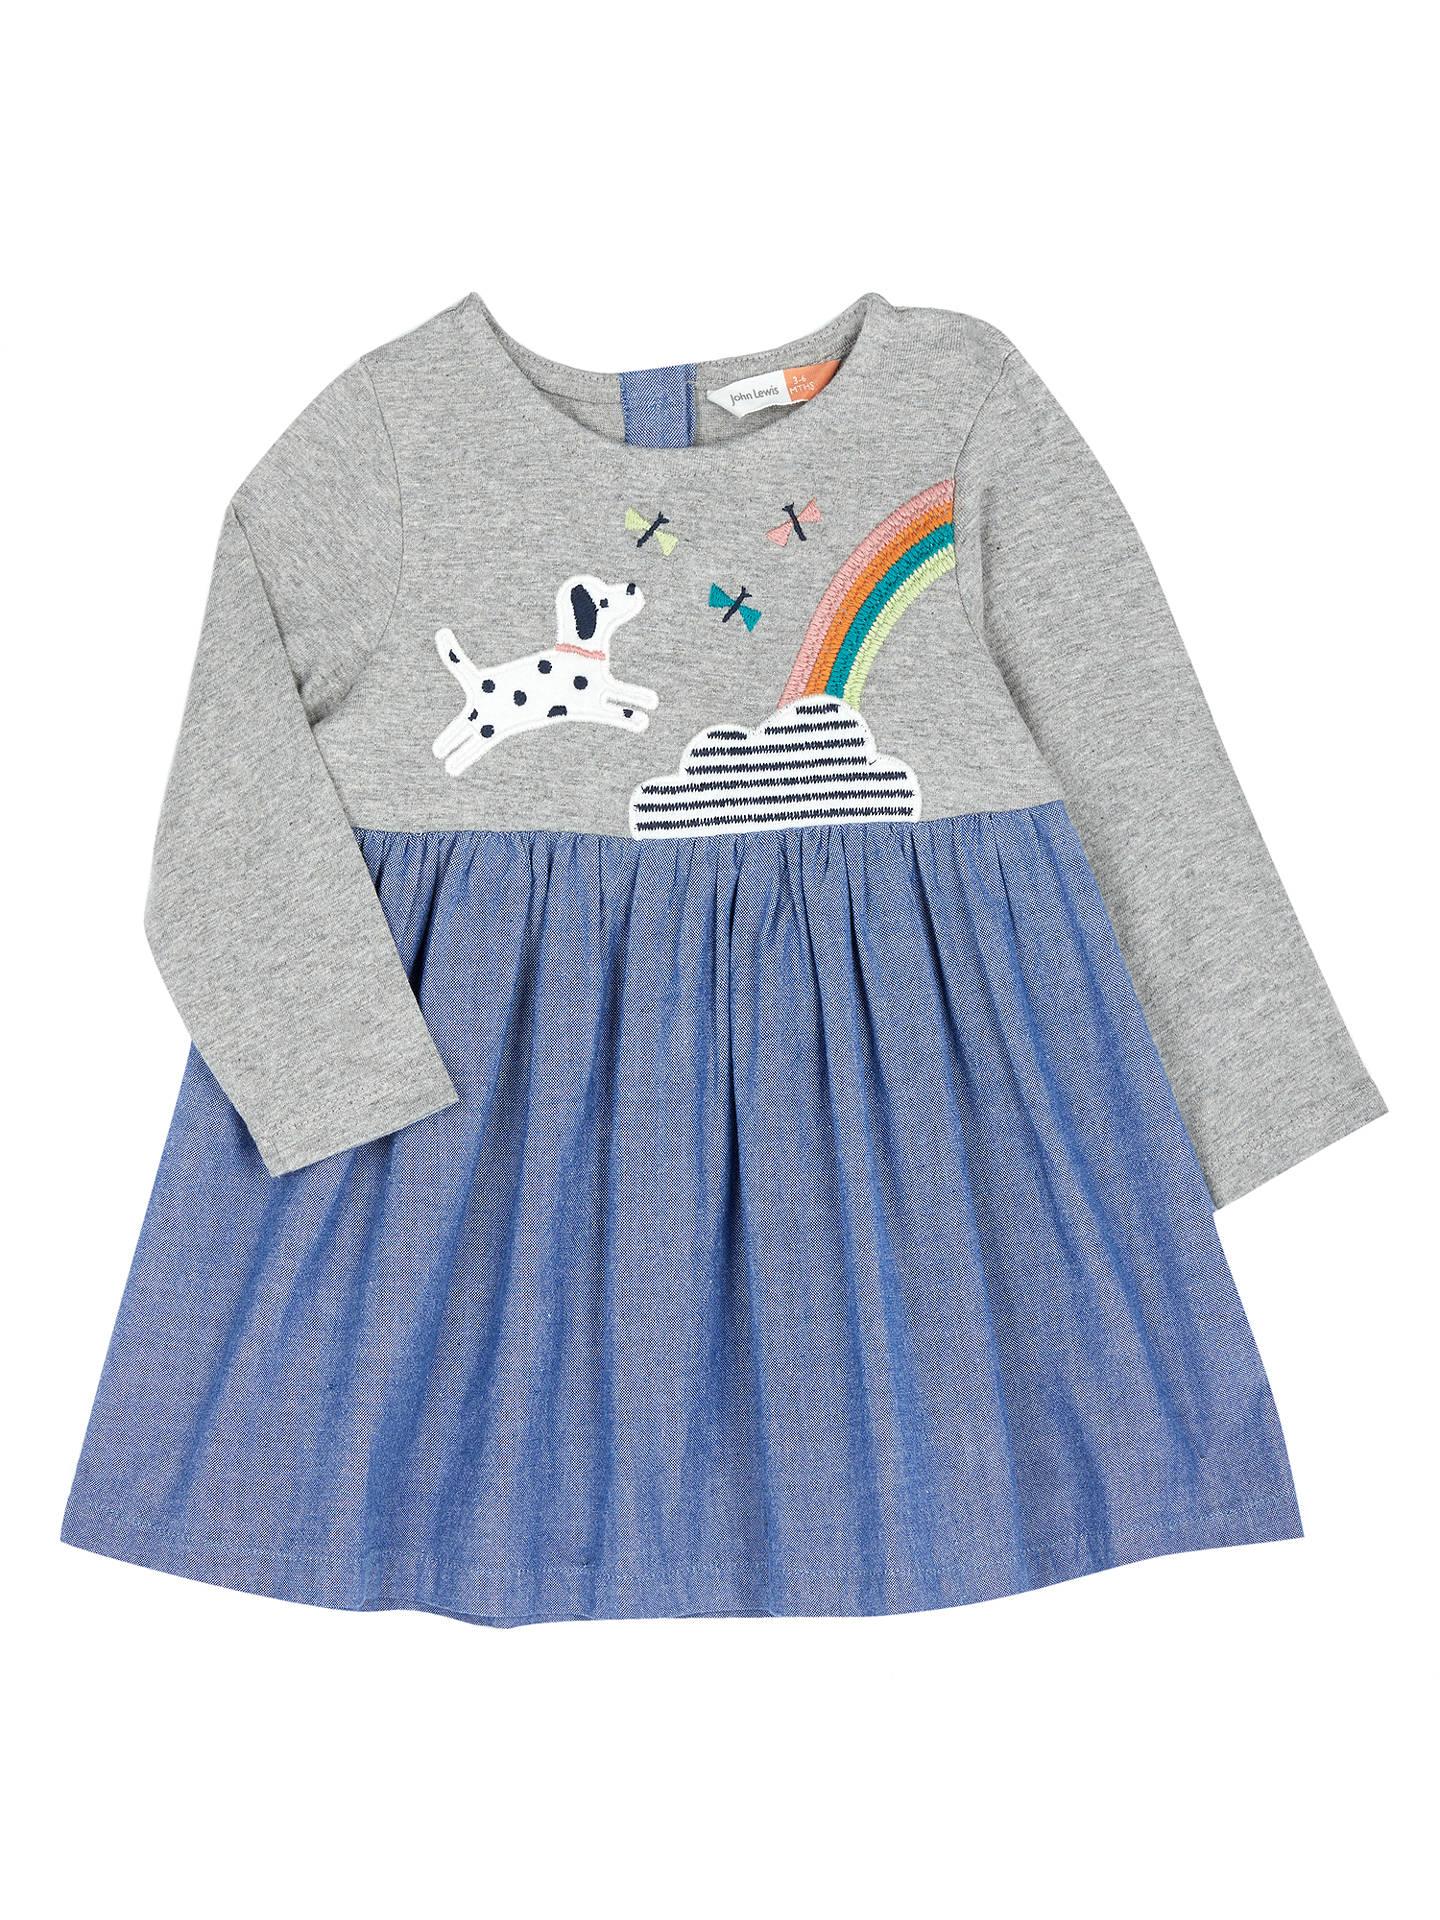 6574675d82 Buy John Lewis   Partners Baby Dog Rainbow Dress